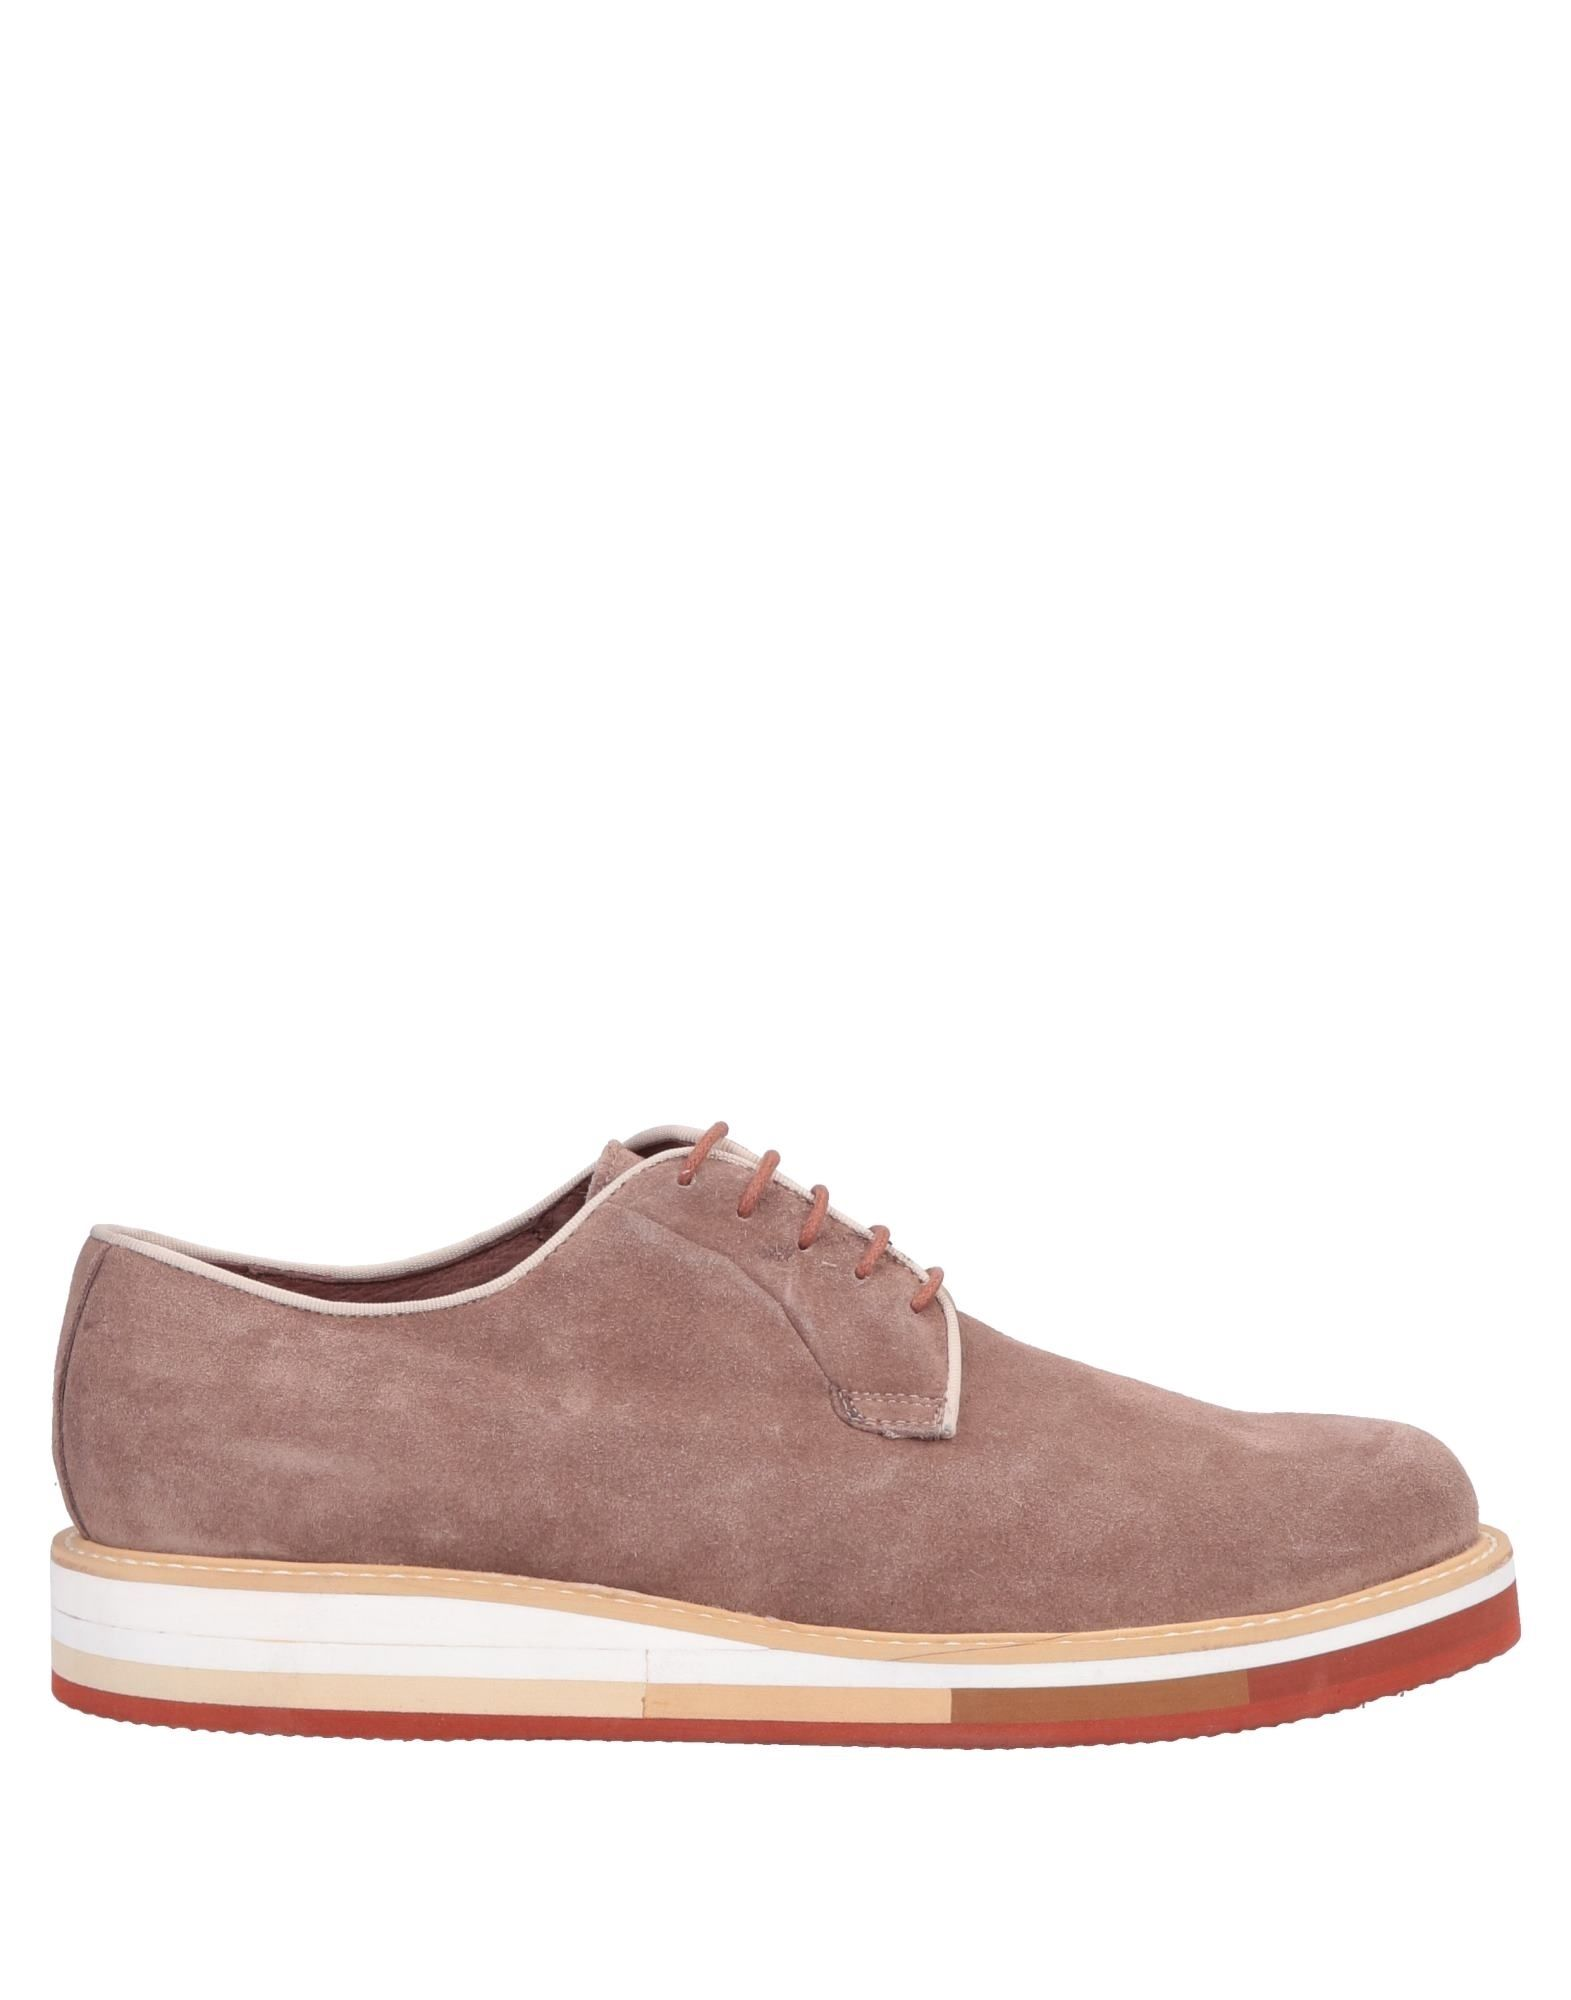 MA.TA MILANO FASHION Обувь на шнурках joyce milano обувь на шнурках